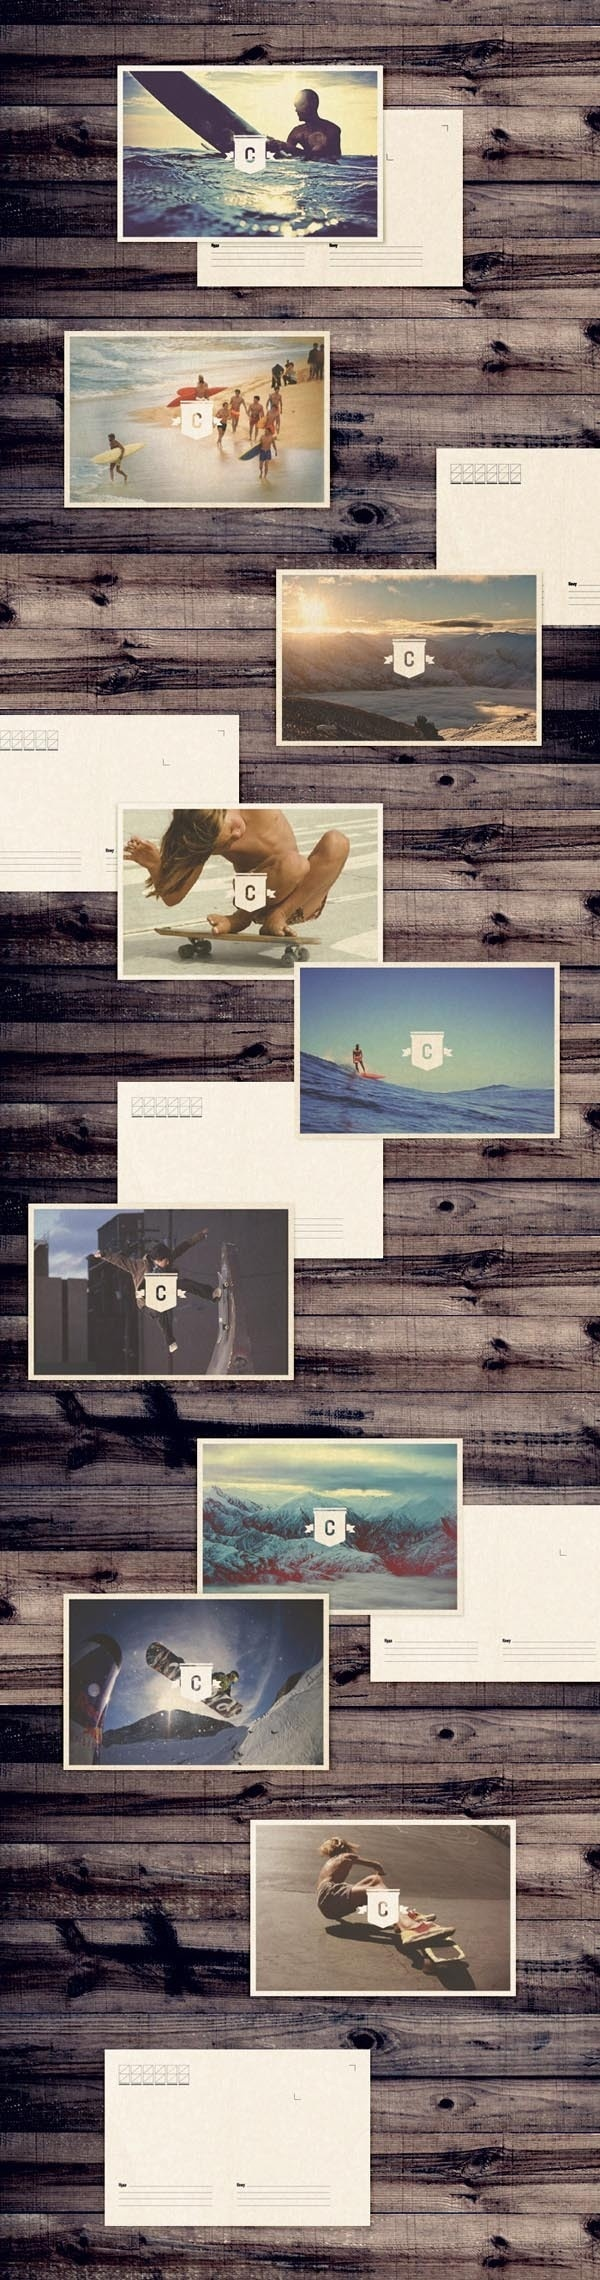 Identity Imaging by Pavel Ripley for Russian Boardshop Skvot #identity #branding